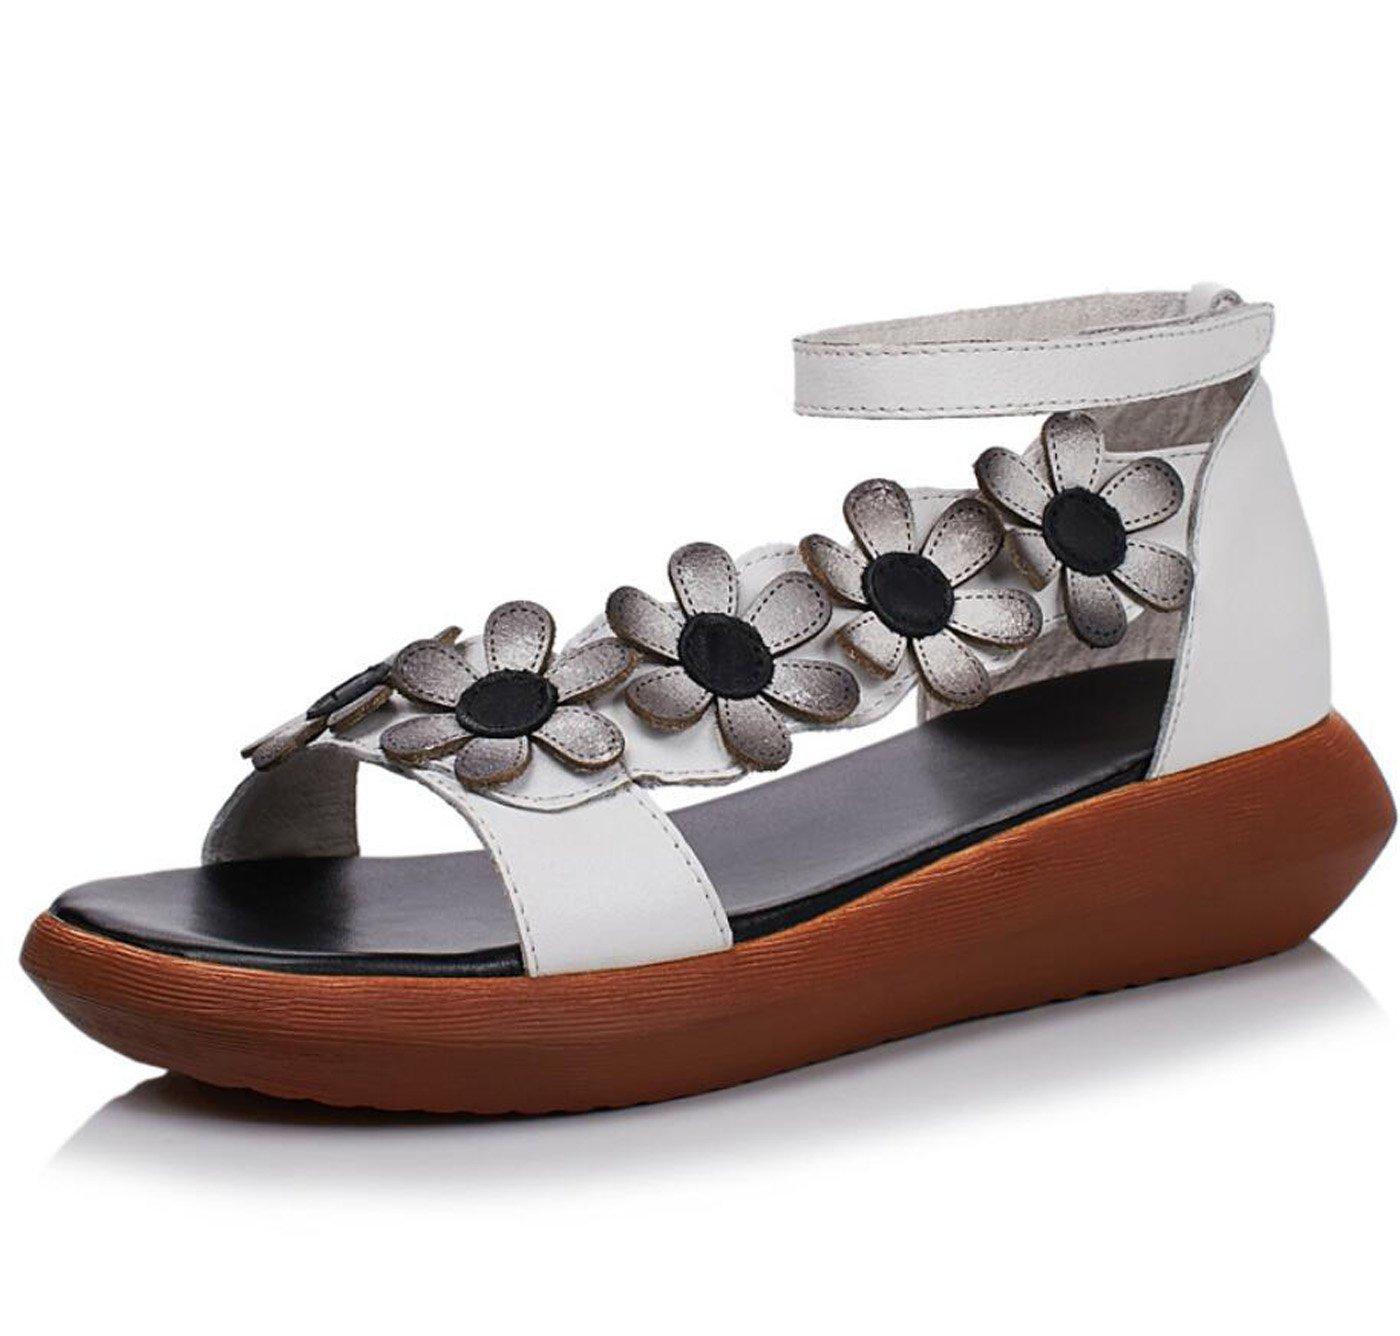 DANDANJIE Sandalen Damen Sommer Neue Mittlere Heels Handgemachte Blume Sandalen Wedges Heel Damen Schuhe (Farbe : Weiszlig;, Grouml;szlig;e : 37)  37 Wei?